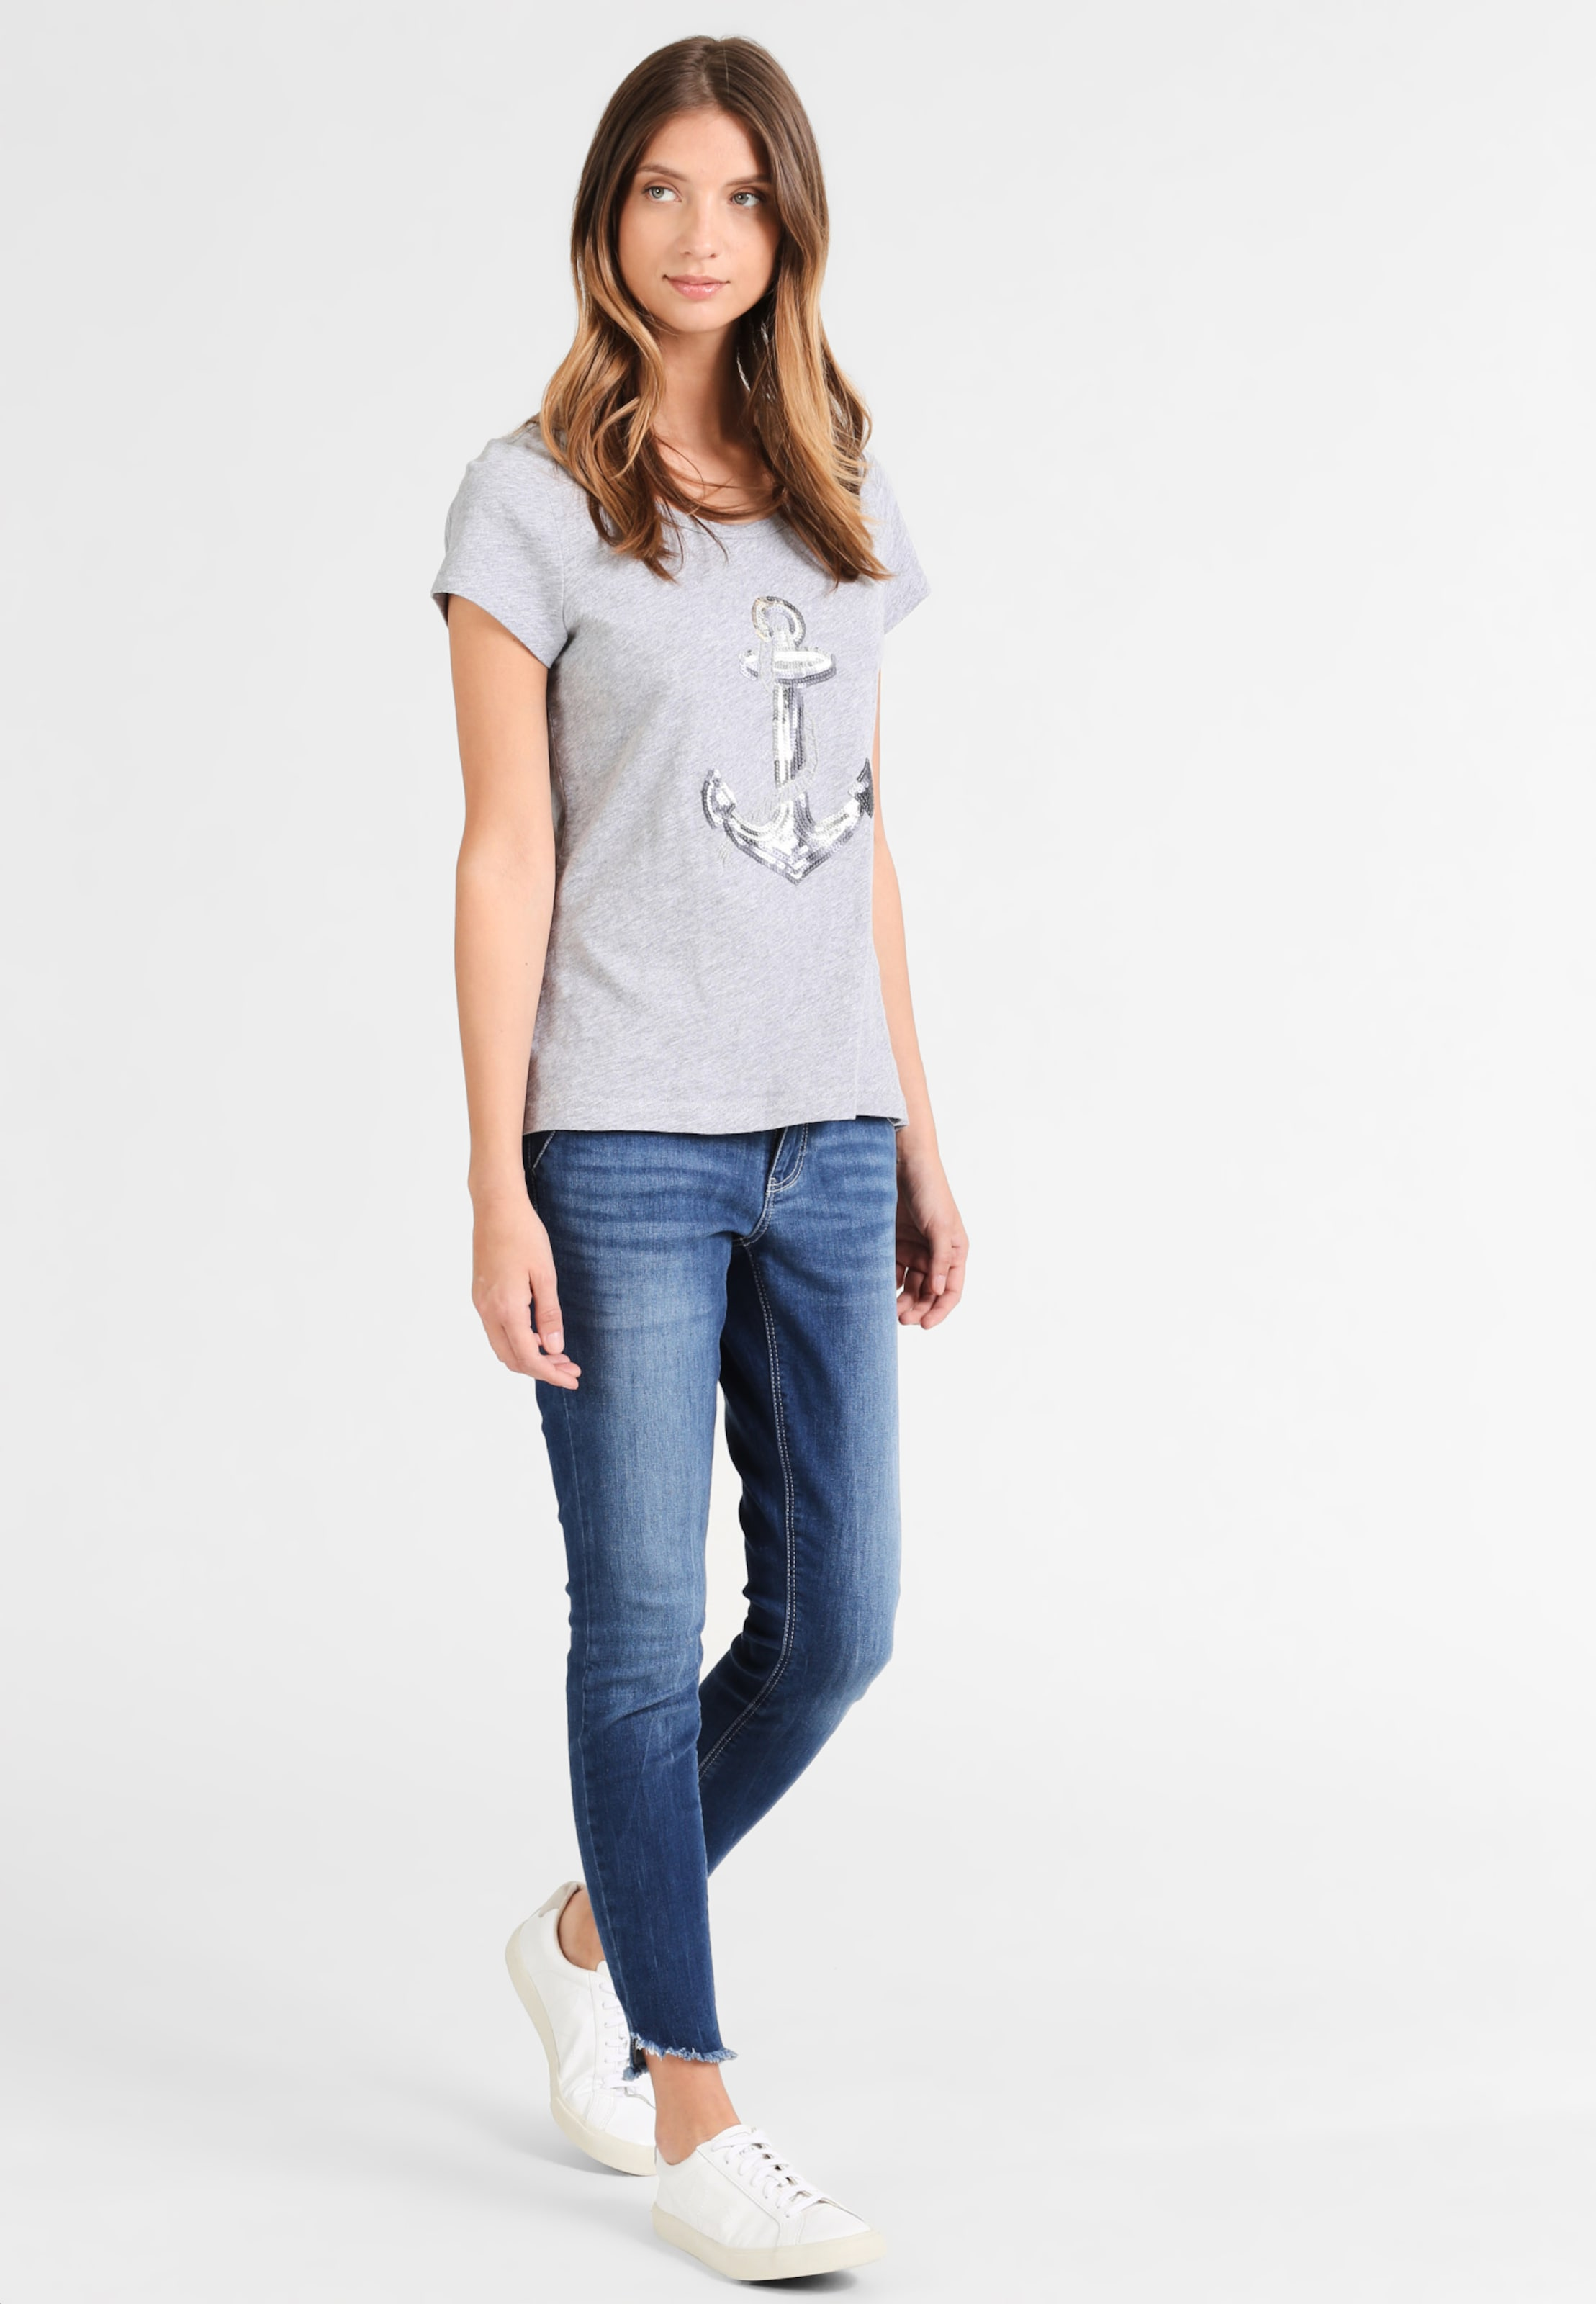 shirt Grau T Damen Dreimaster In L4R35jqA